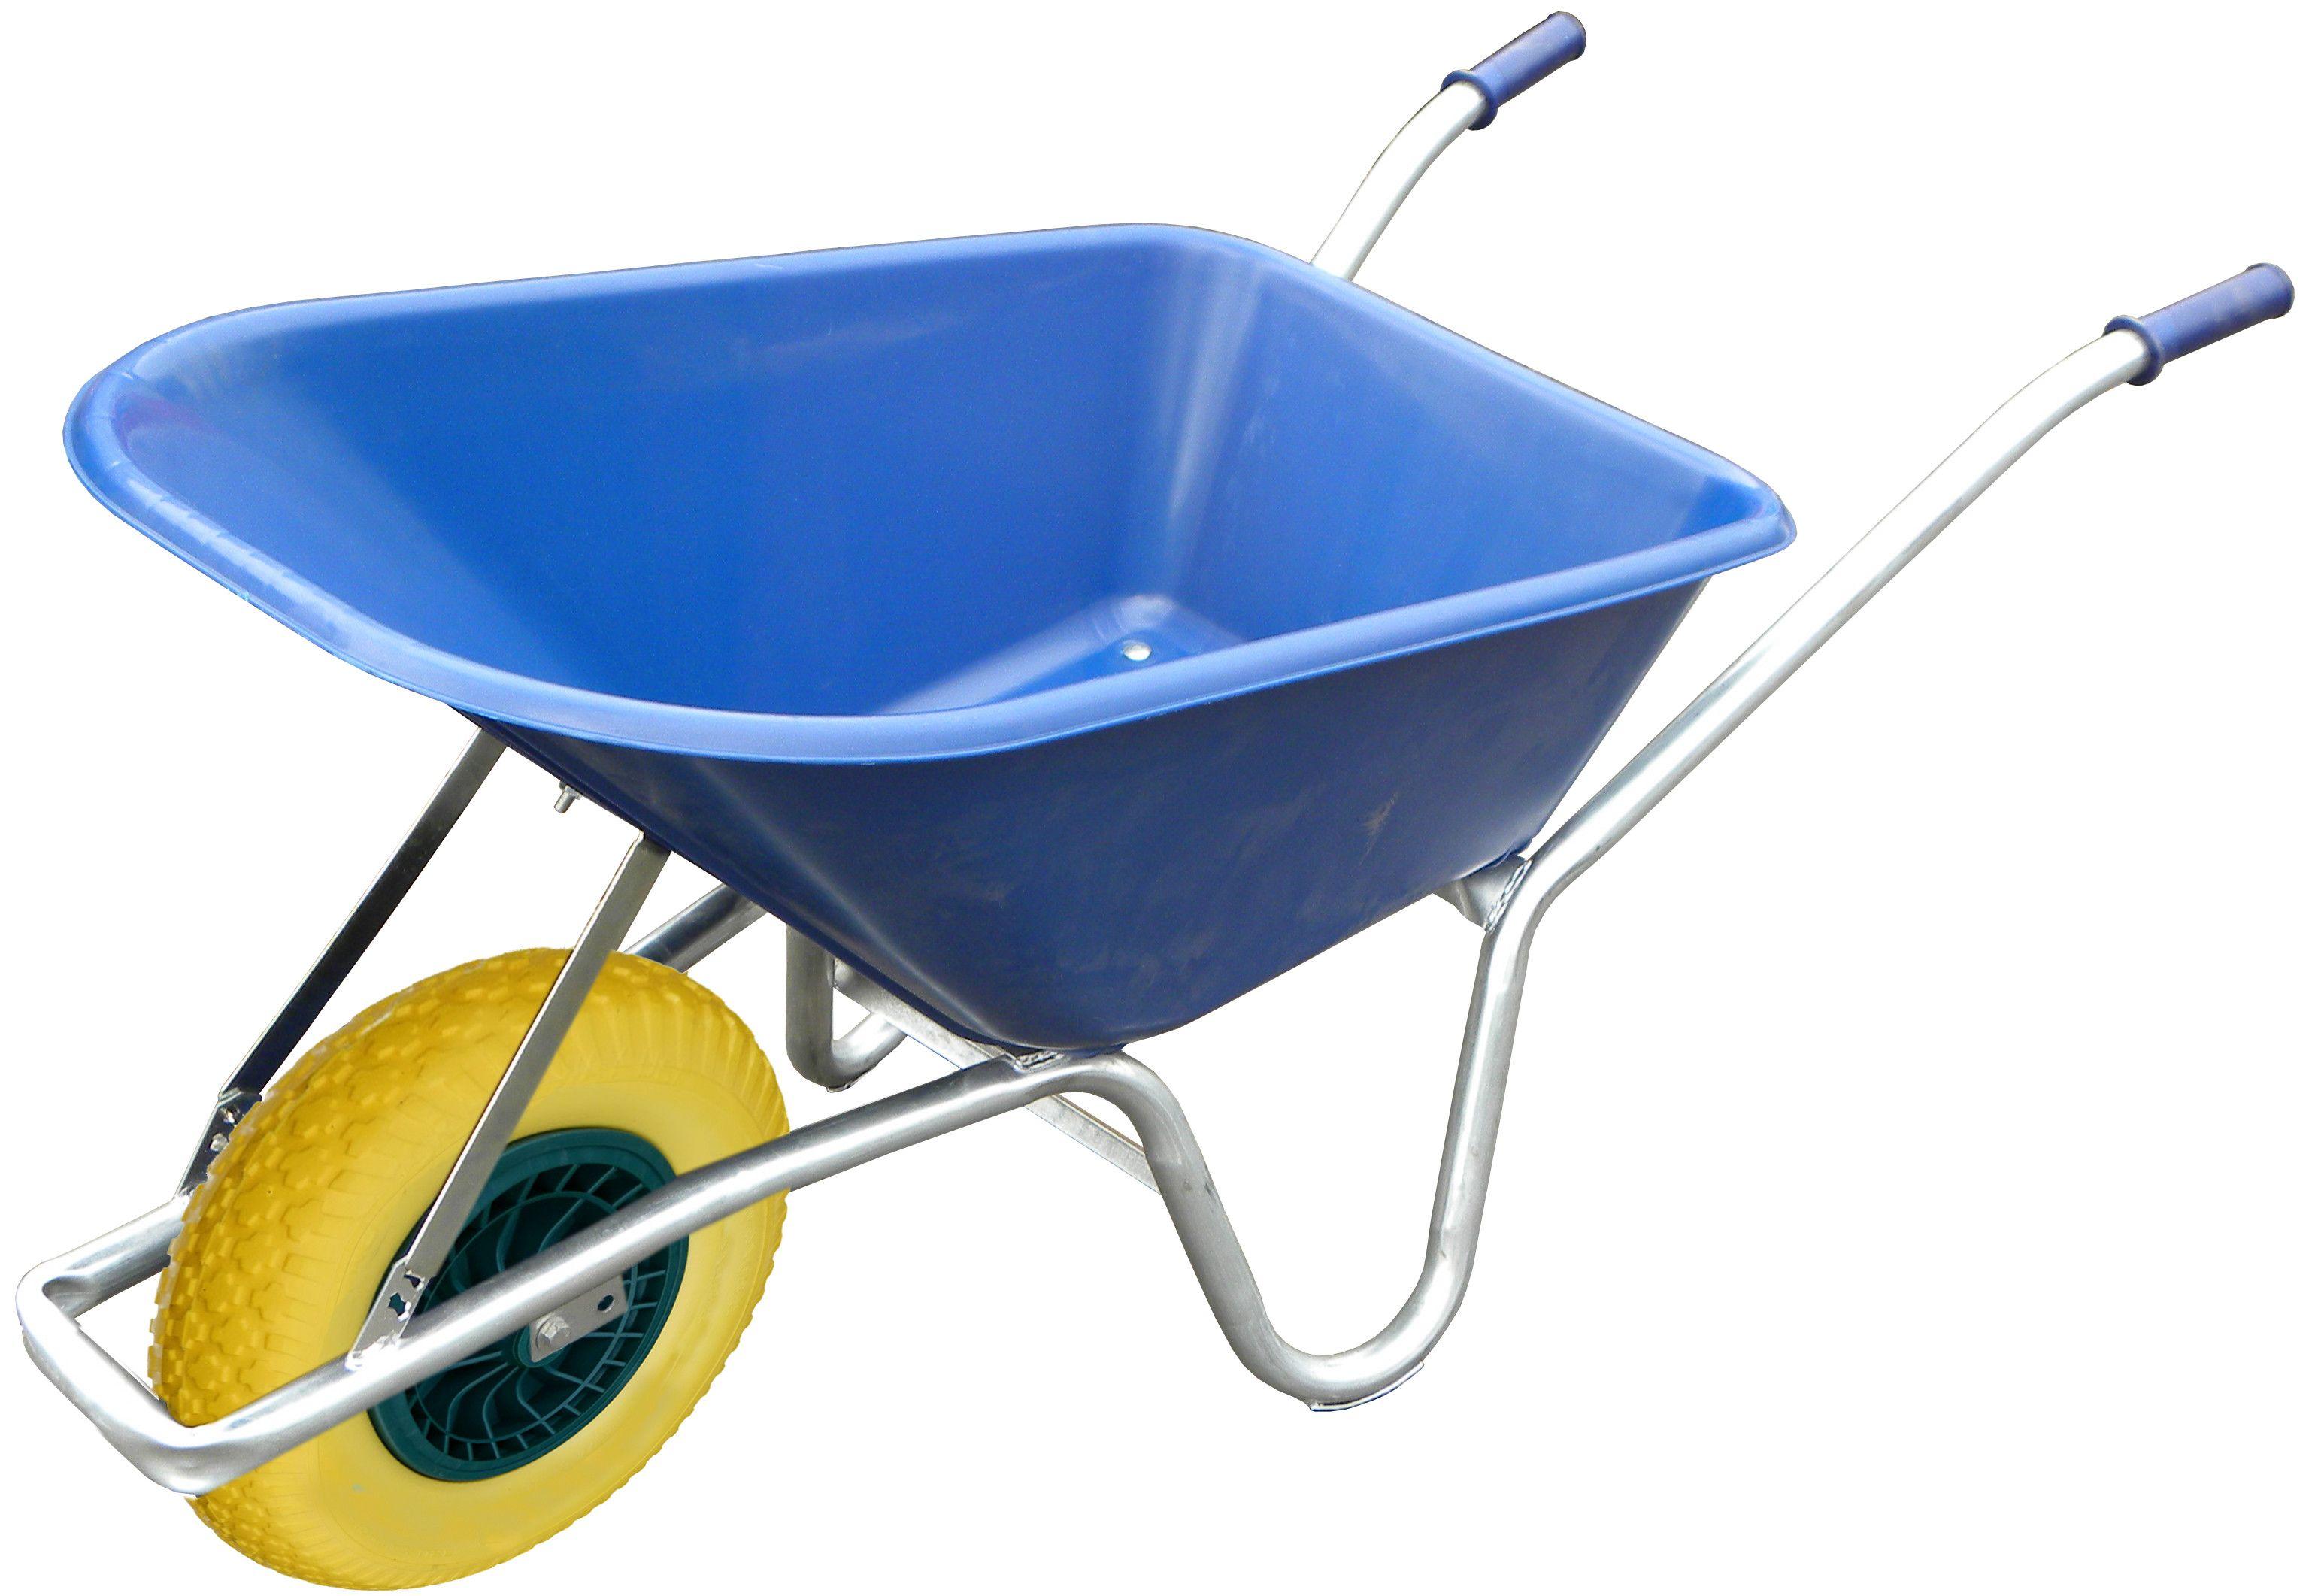 100L Blue Wheelbarrow With Flat Proof Wheel